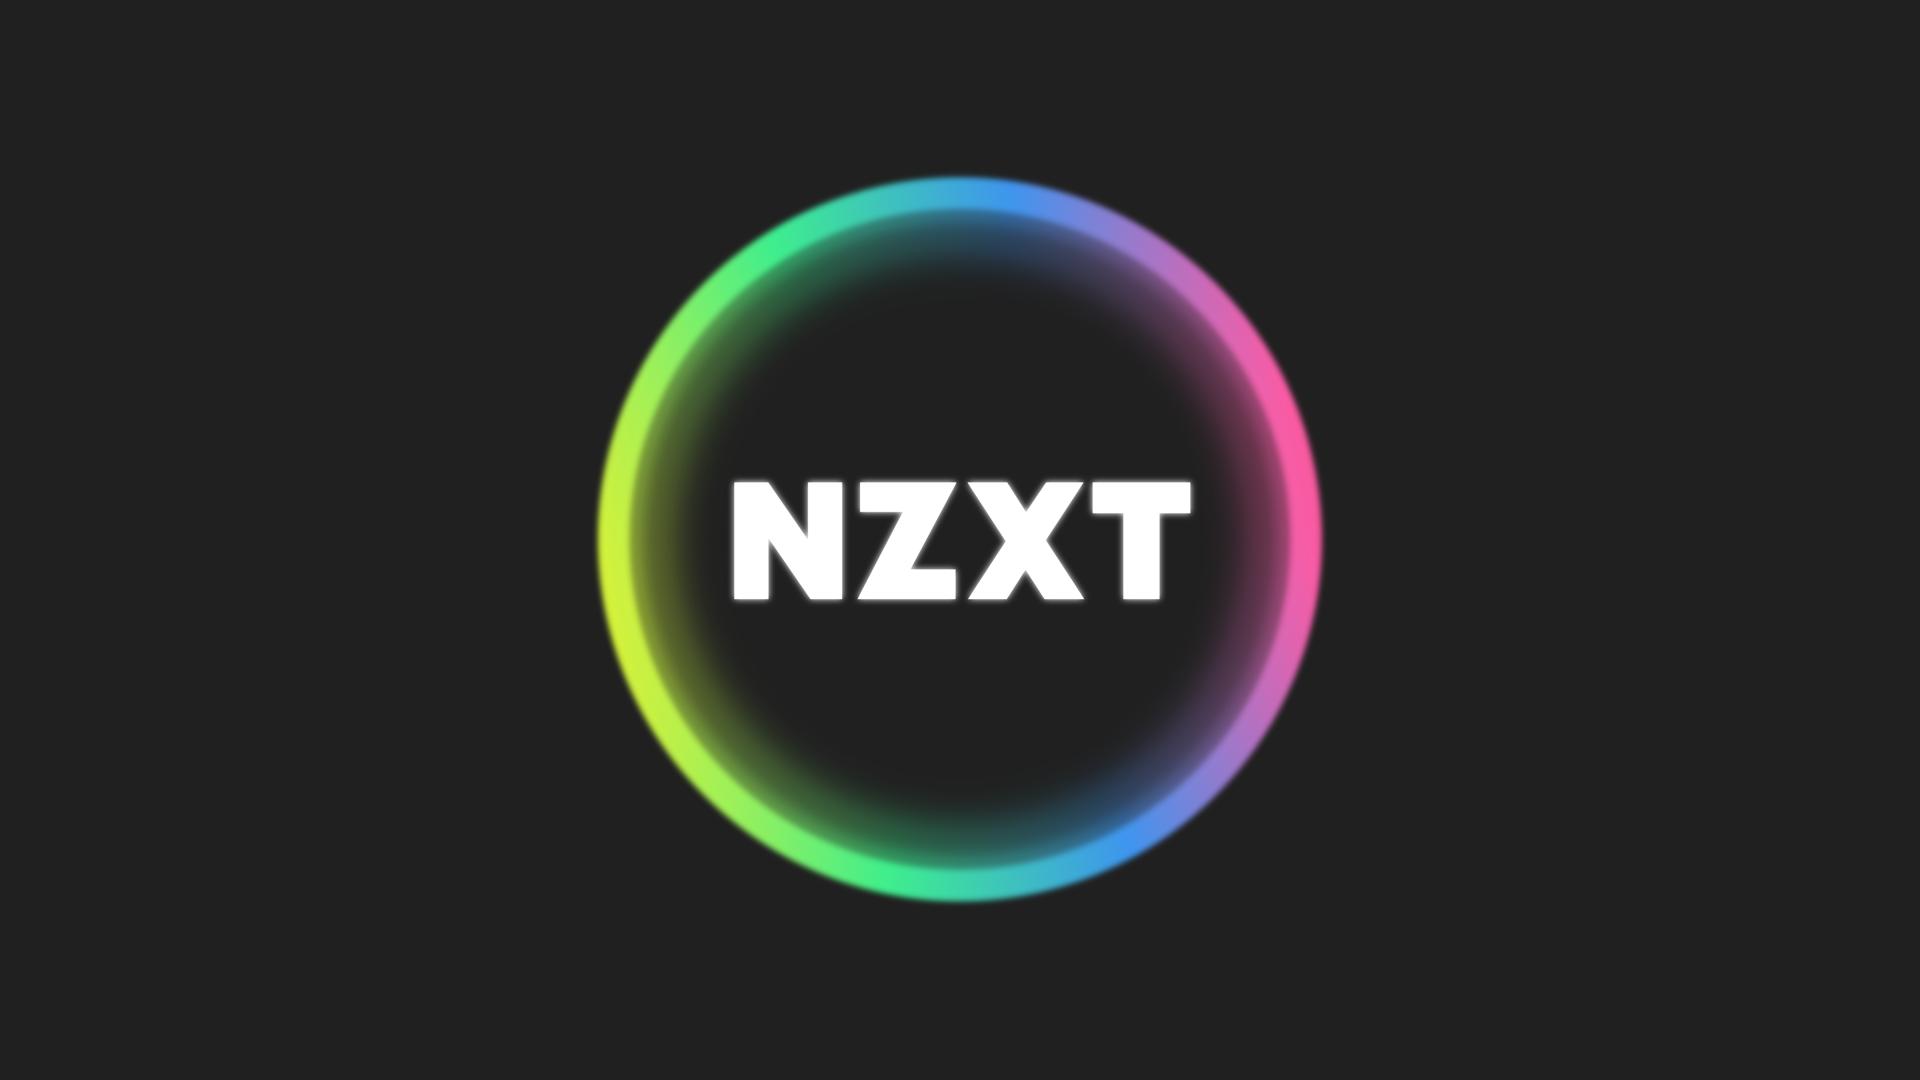 NZXT RGB - V2 - VIDEO - Wallpaper engine by MrRichardEdits ...